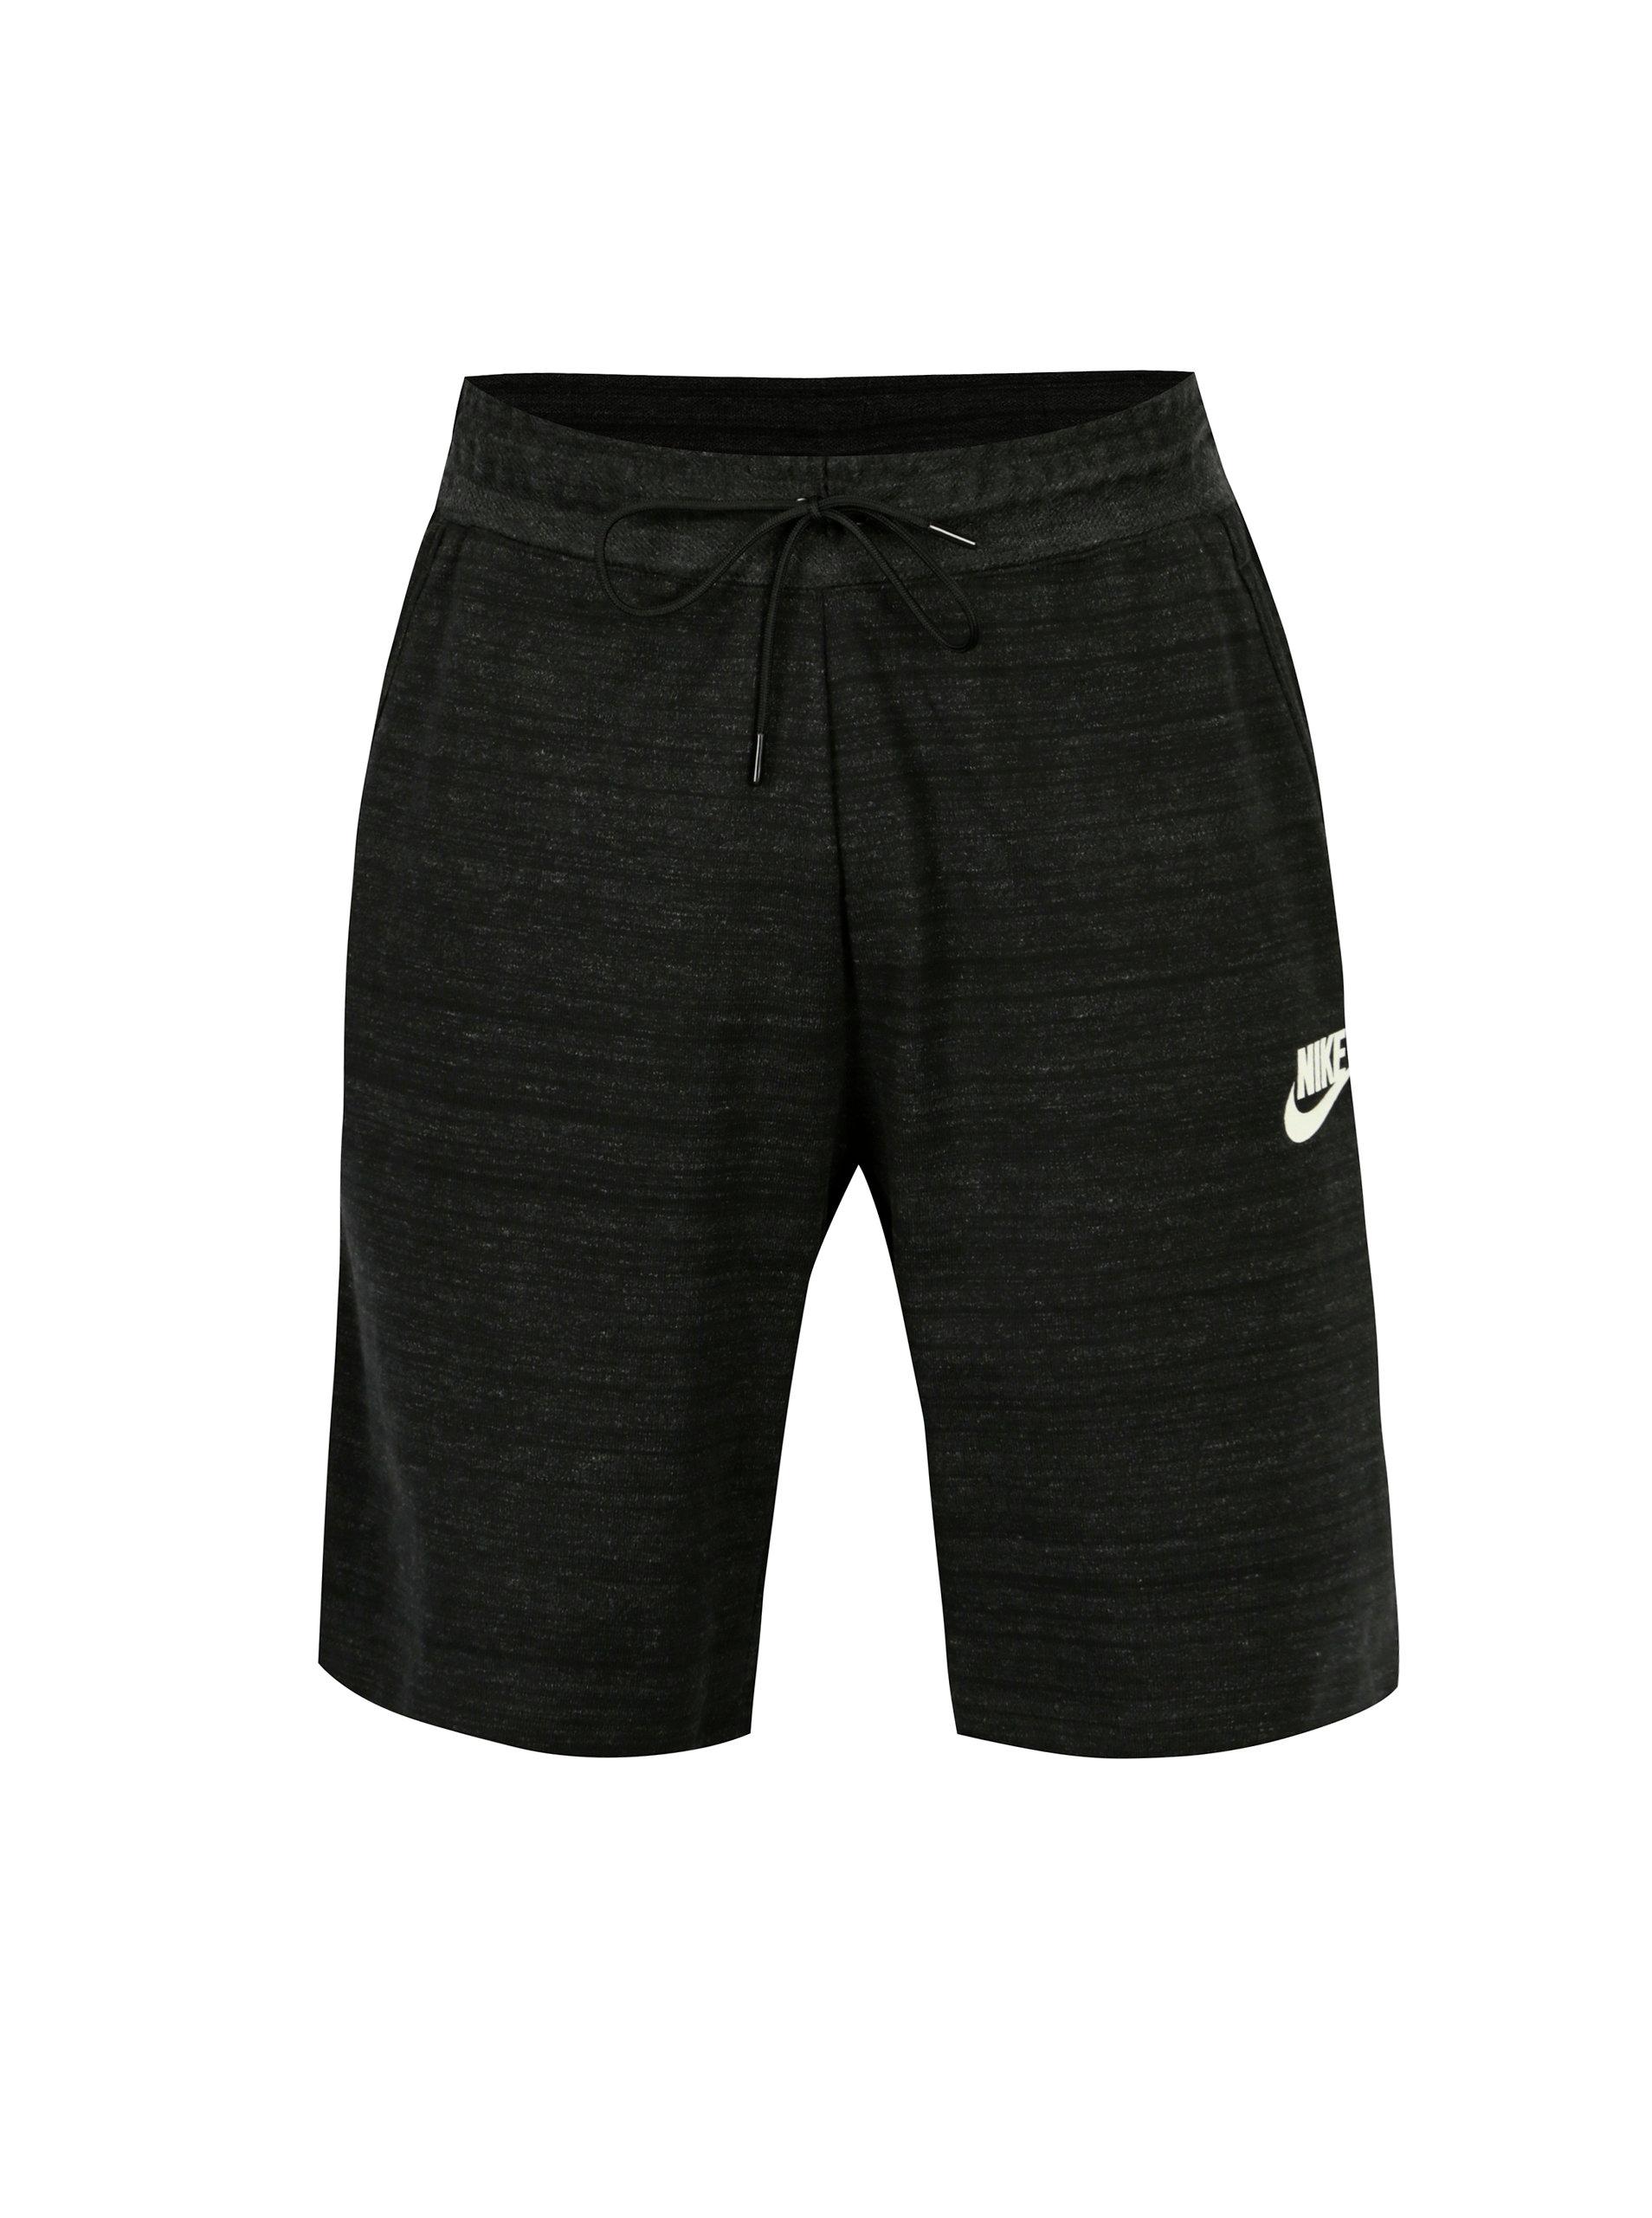 15f29de5e8a Tmavě šedé žíhané pánské standart fit kraťasy Nike ...